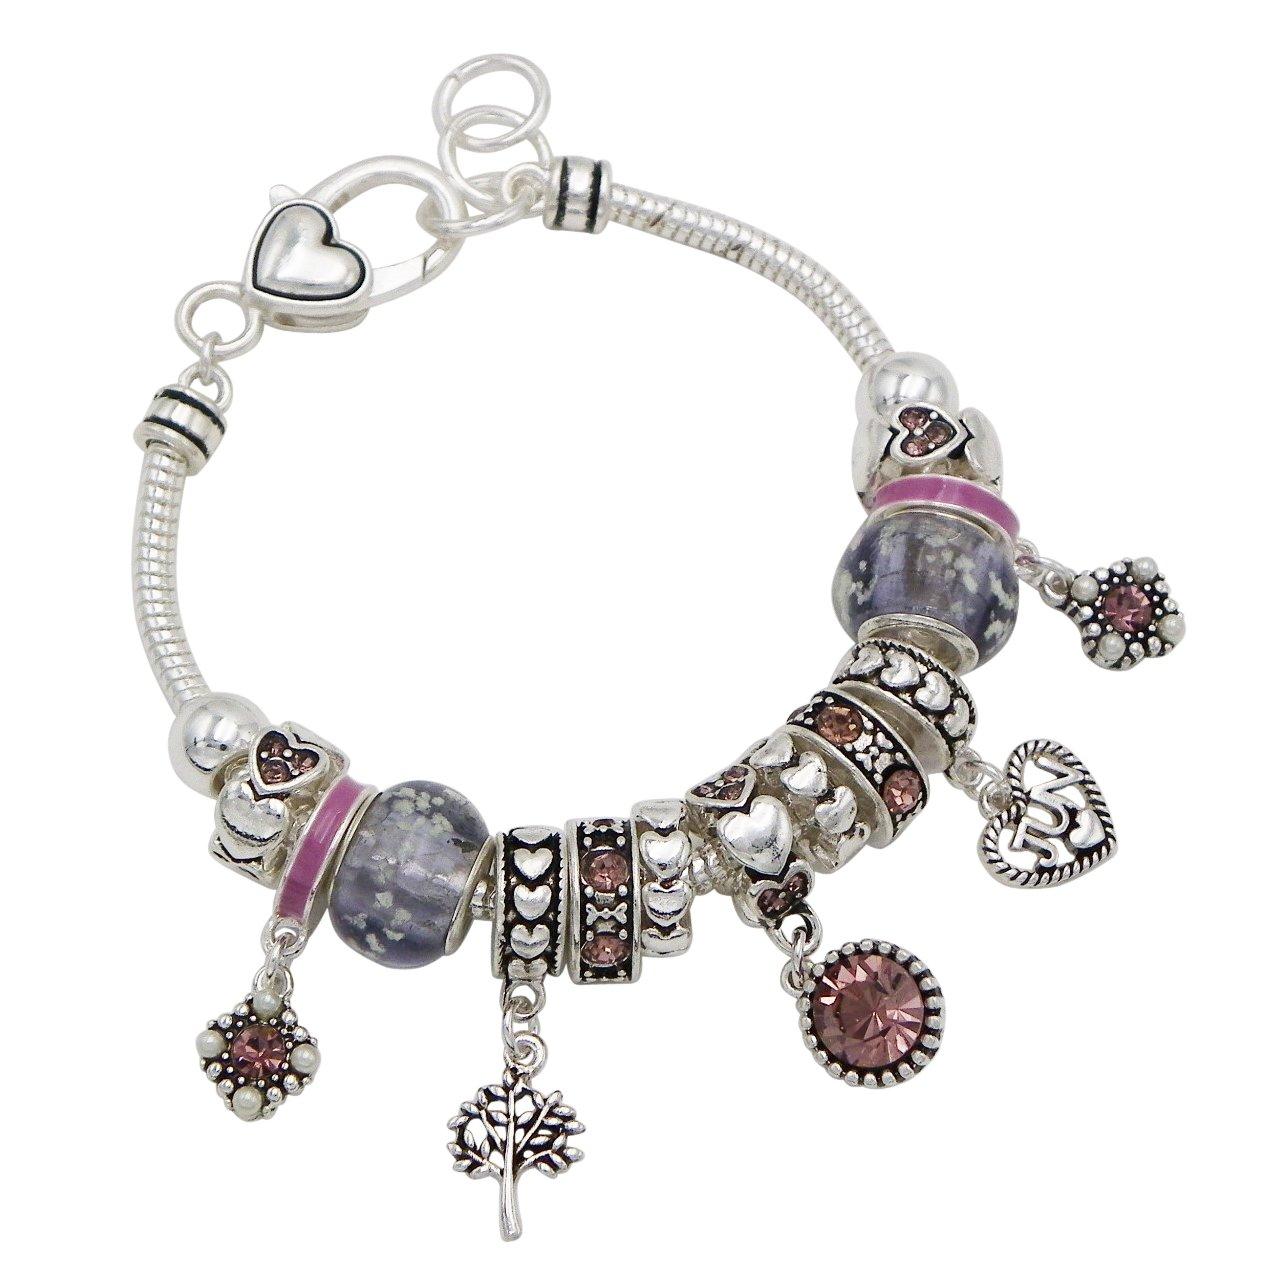 Rosemarie Collections Women's Birth Month Birthstone Glass Bead Charm Bracelet (June)